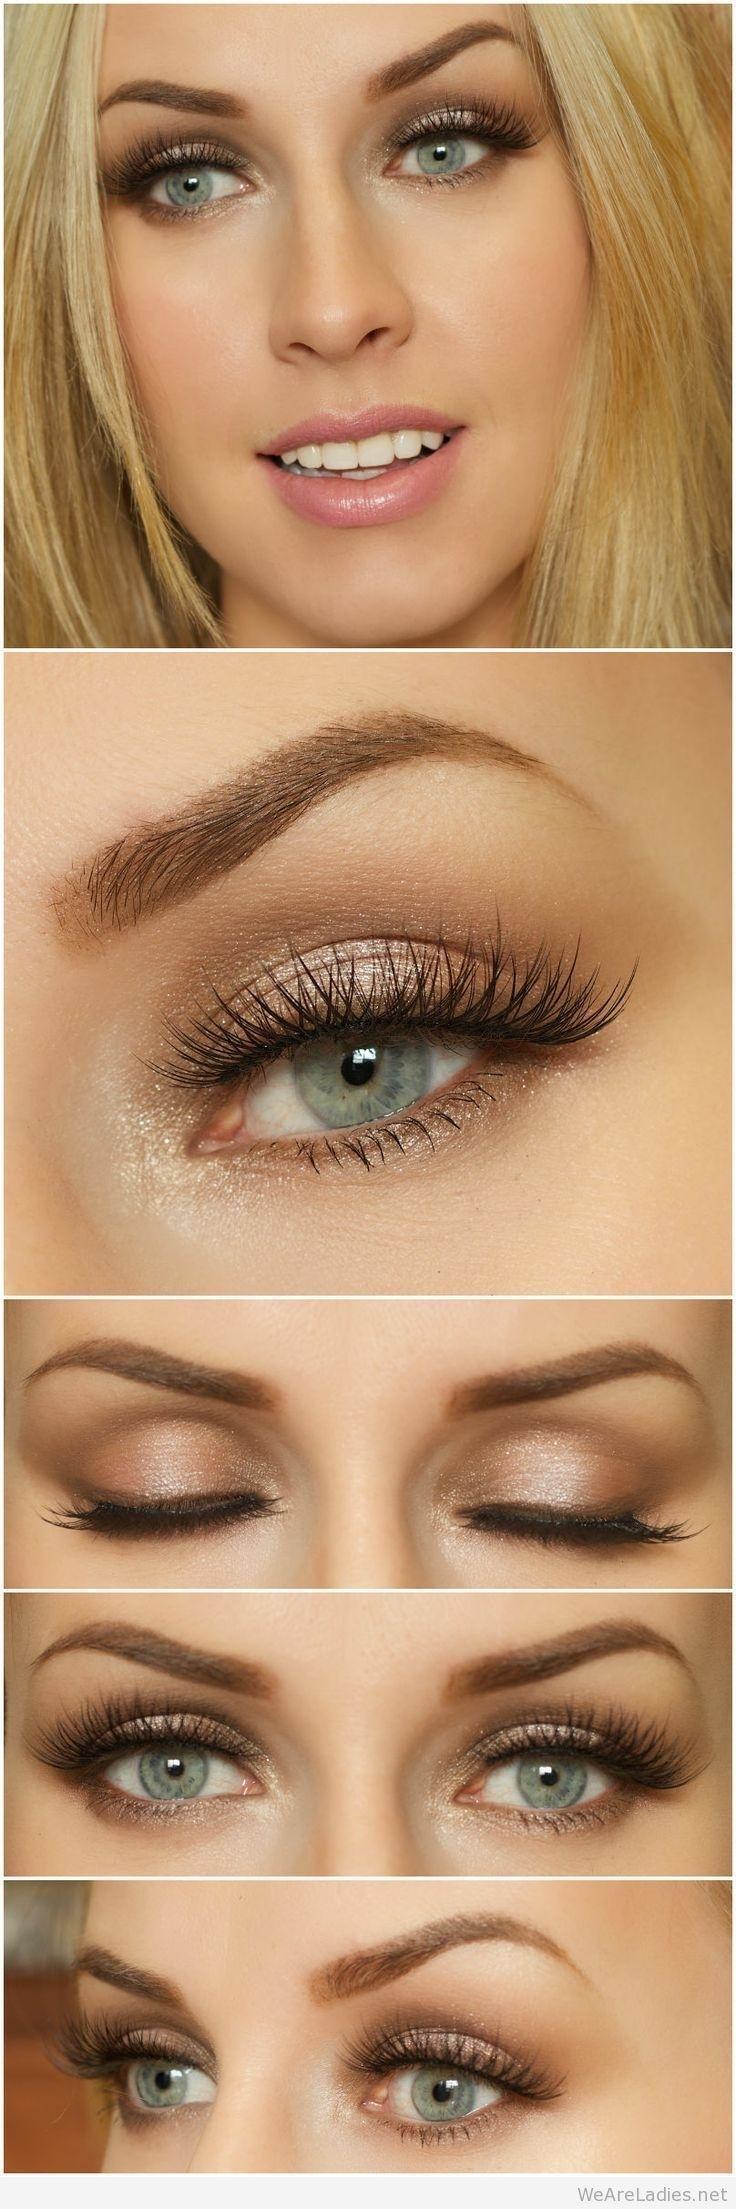 Eye Makeup For Green Eyes And Fair Skin - Wavy Haircut